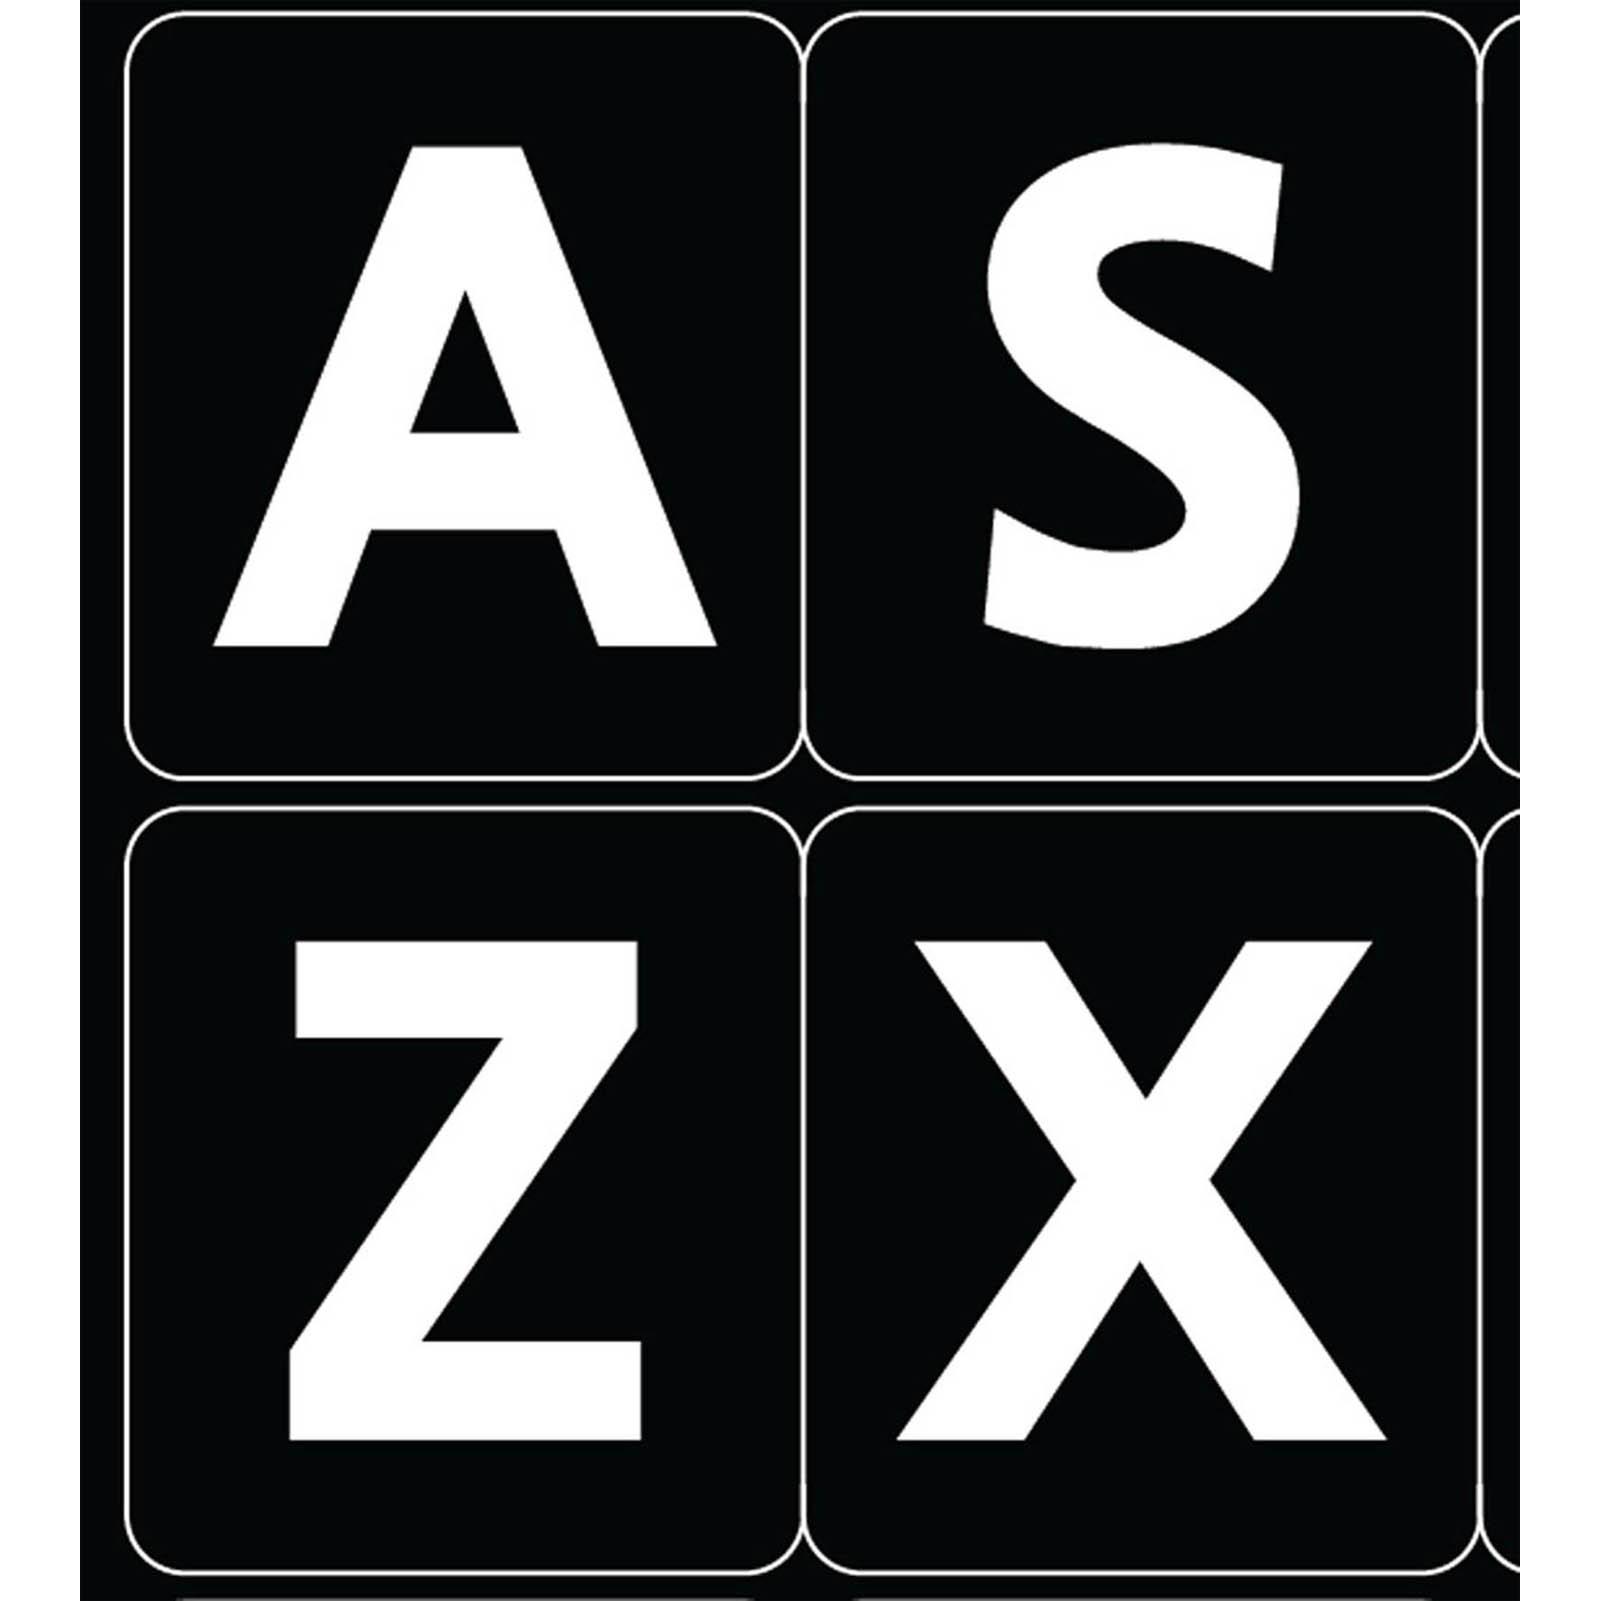 english us large letters keyboard sticker black